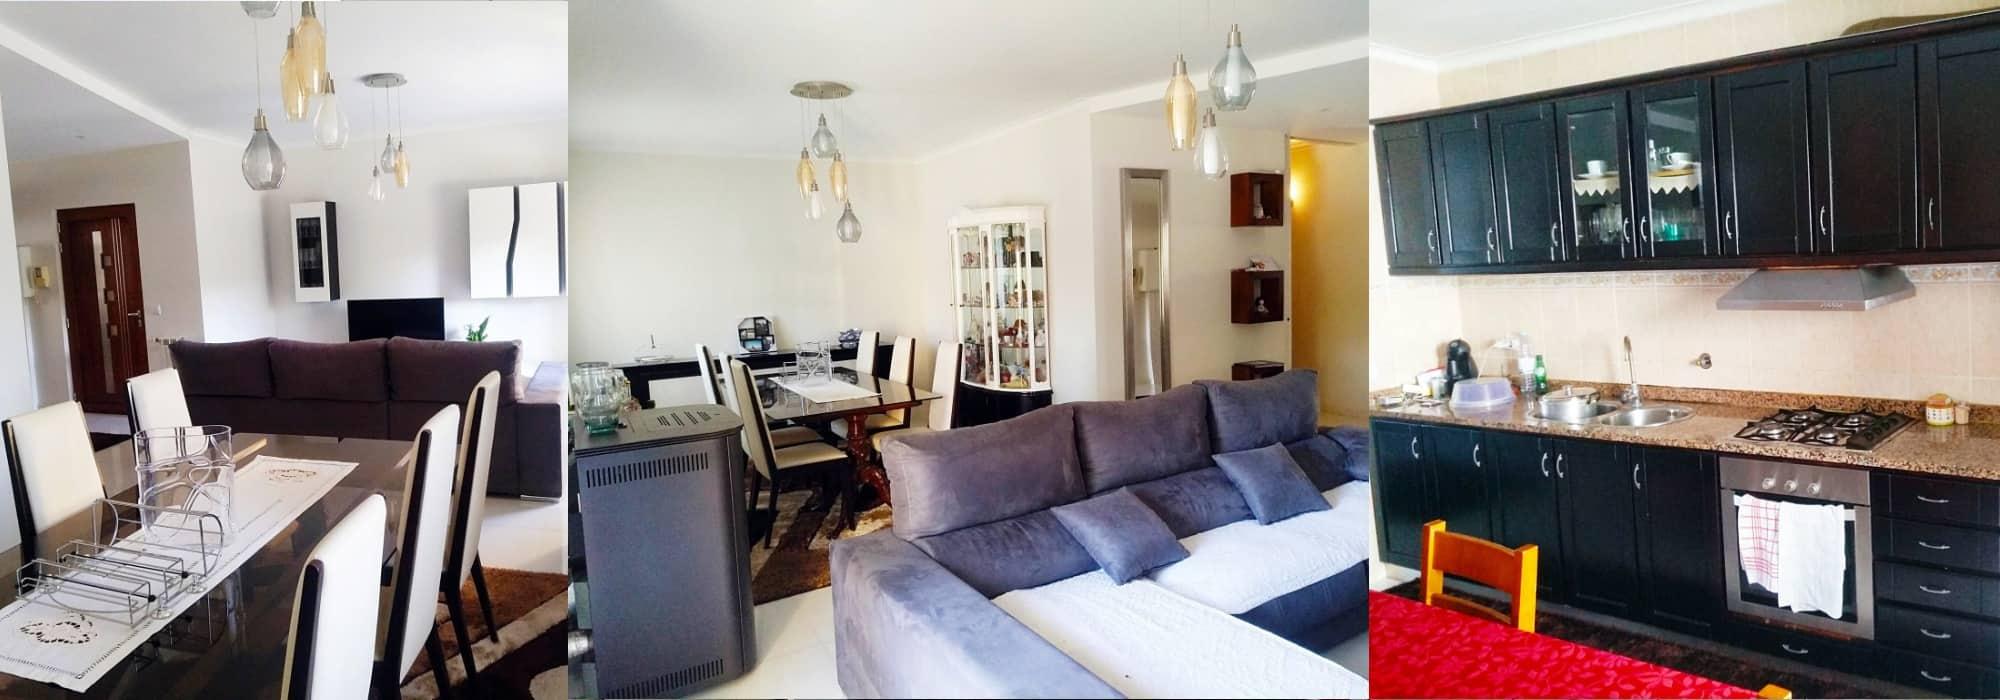 Apartamento T3 renovado – Amarante (Centro)